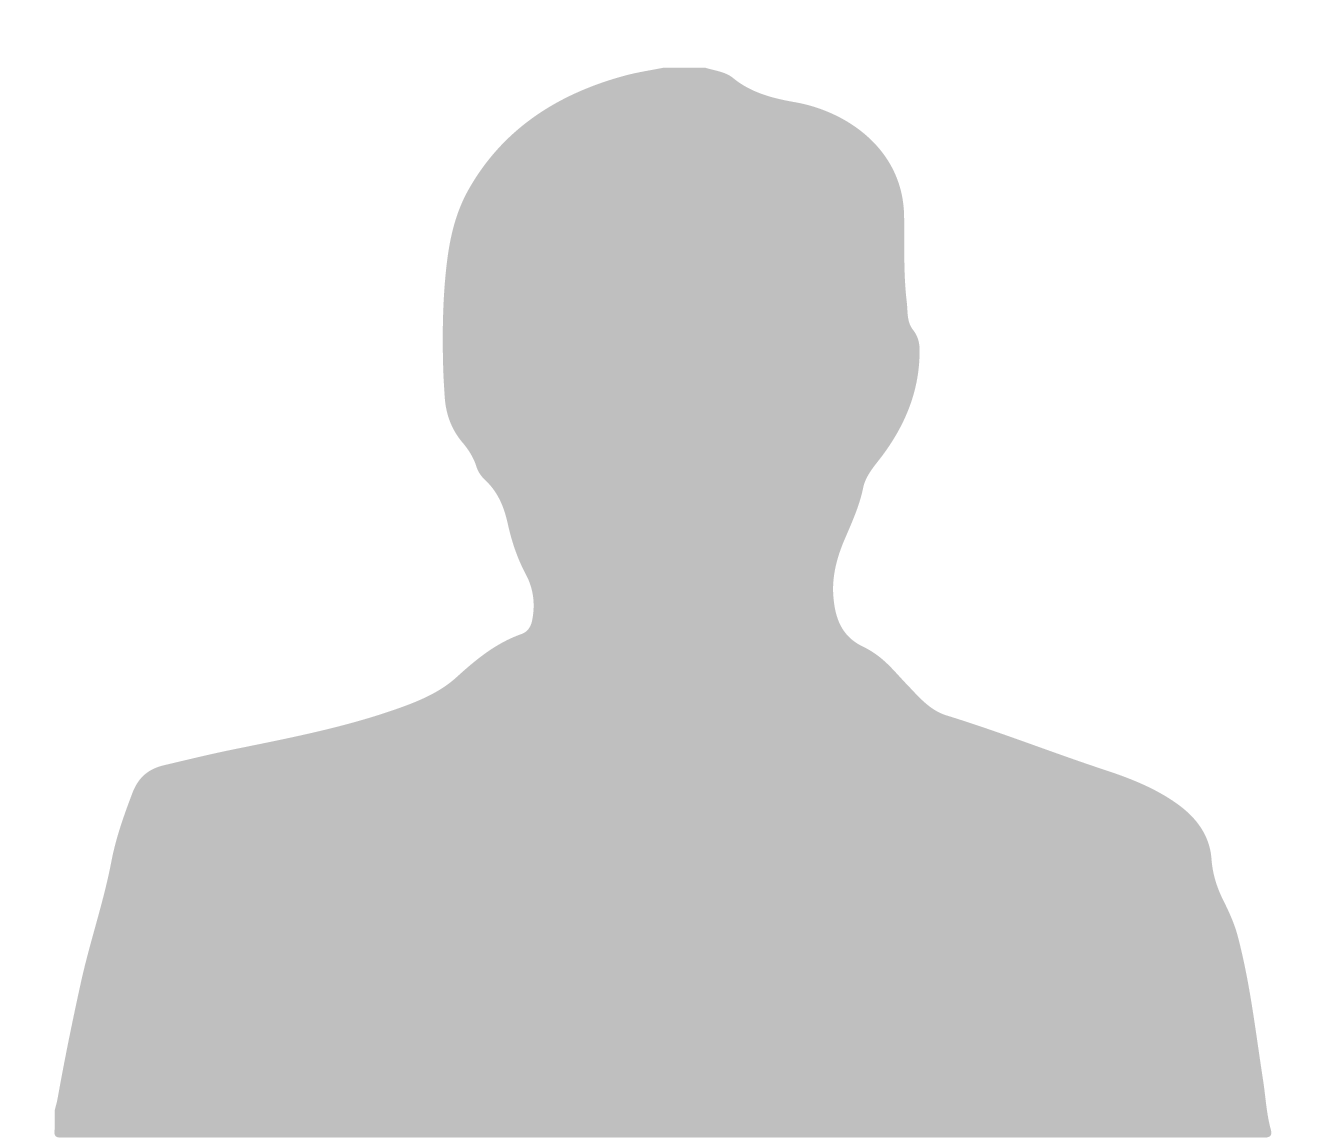 Employee_Placeholder.jpg